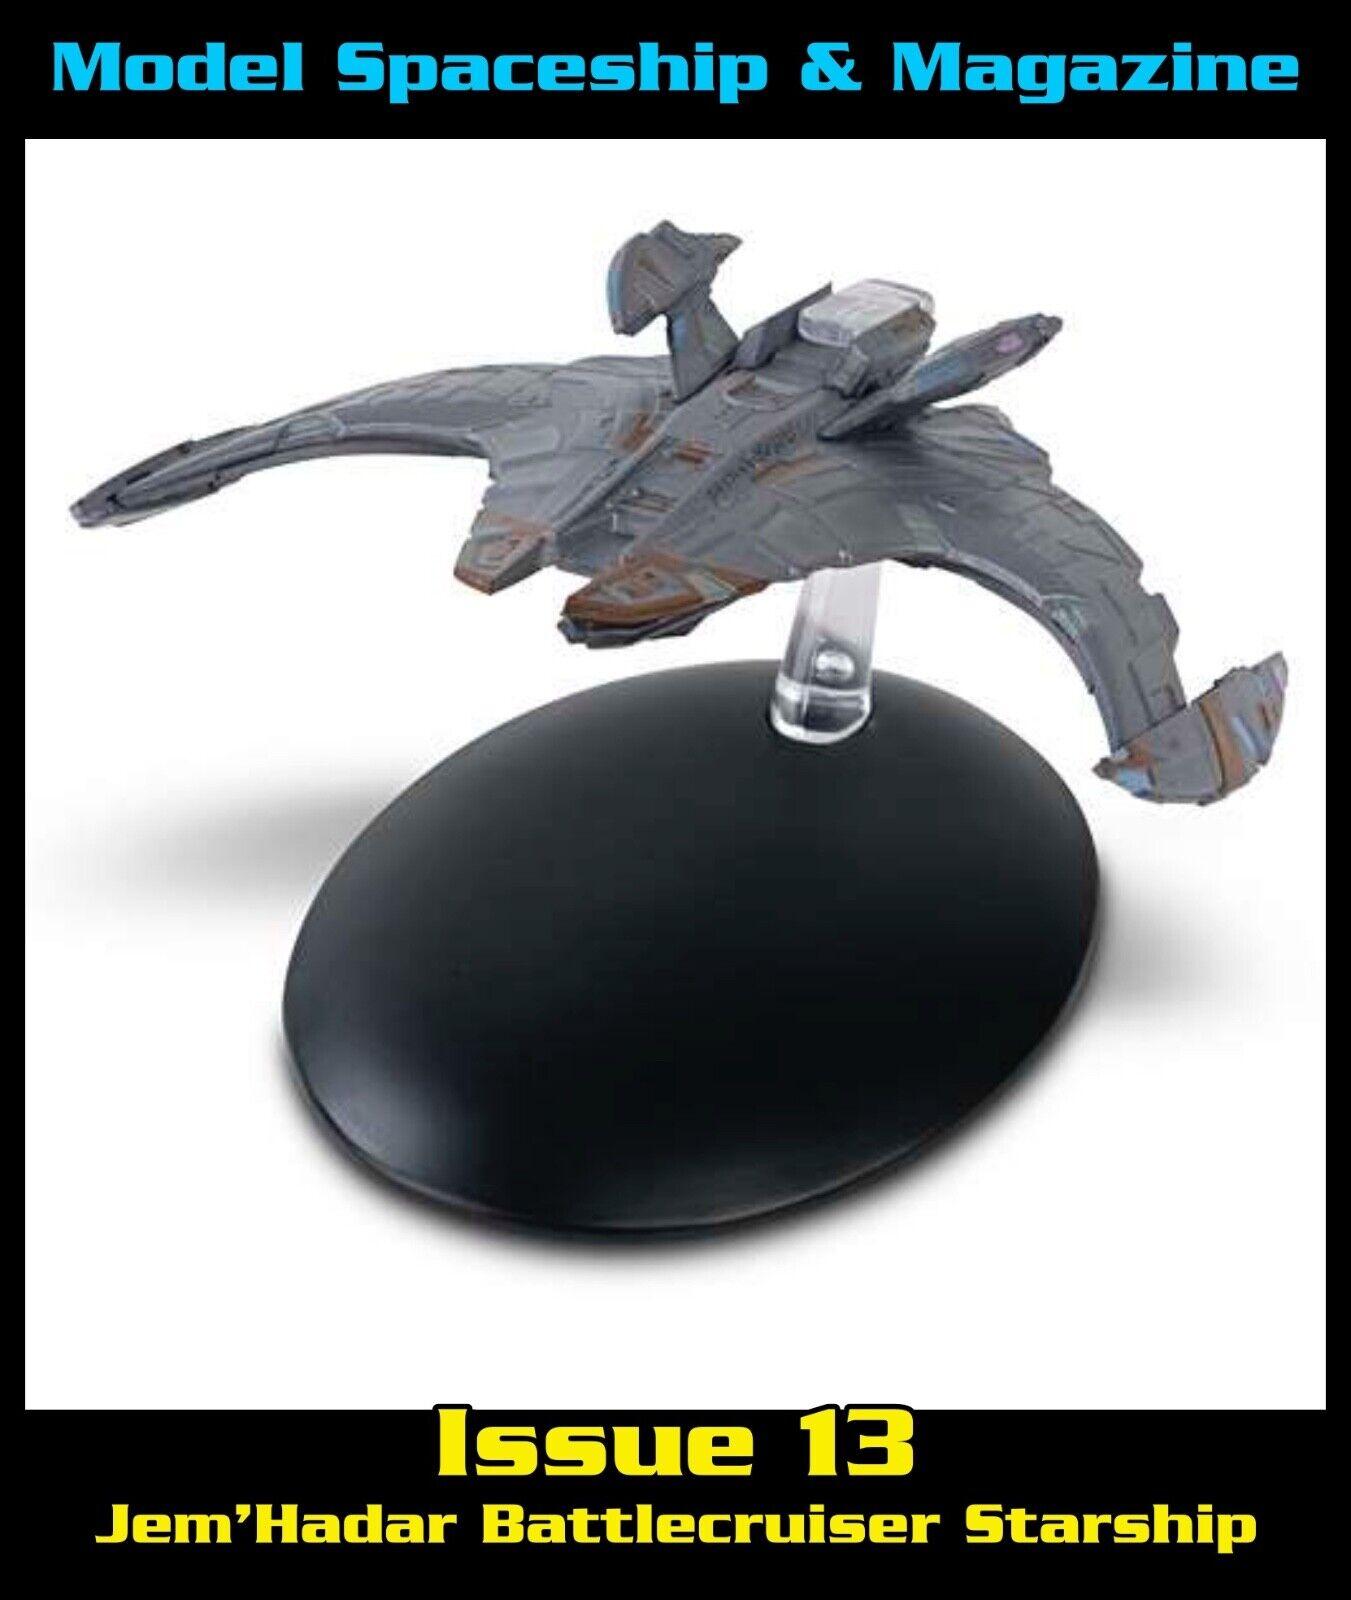 Issue 13: Jem'Hadar Battlecruiser Starship